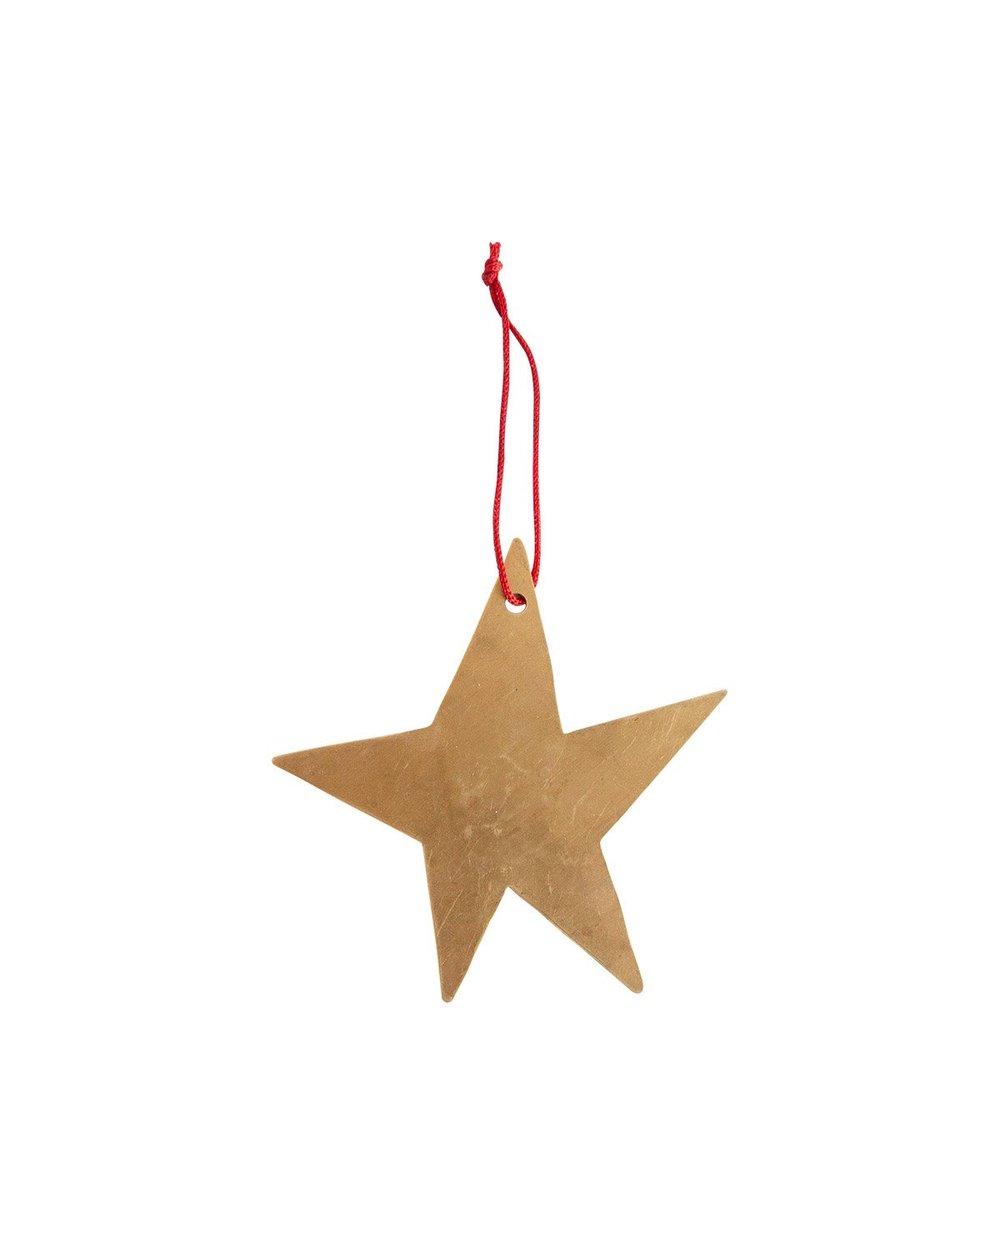 Brass_Star_Ornament_1_a1cc9302-36ea-47ca-bace-5182b08dde9a.jpg